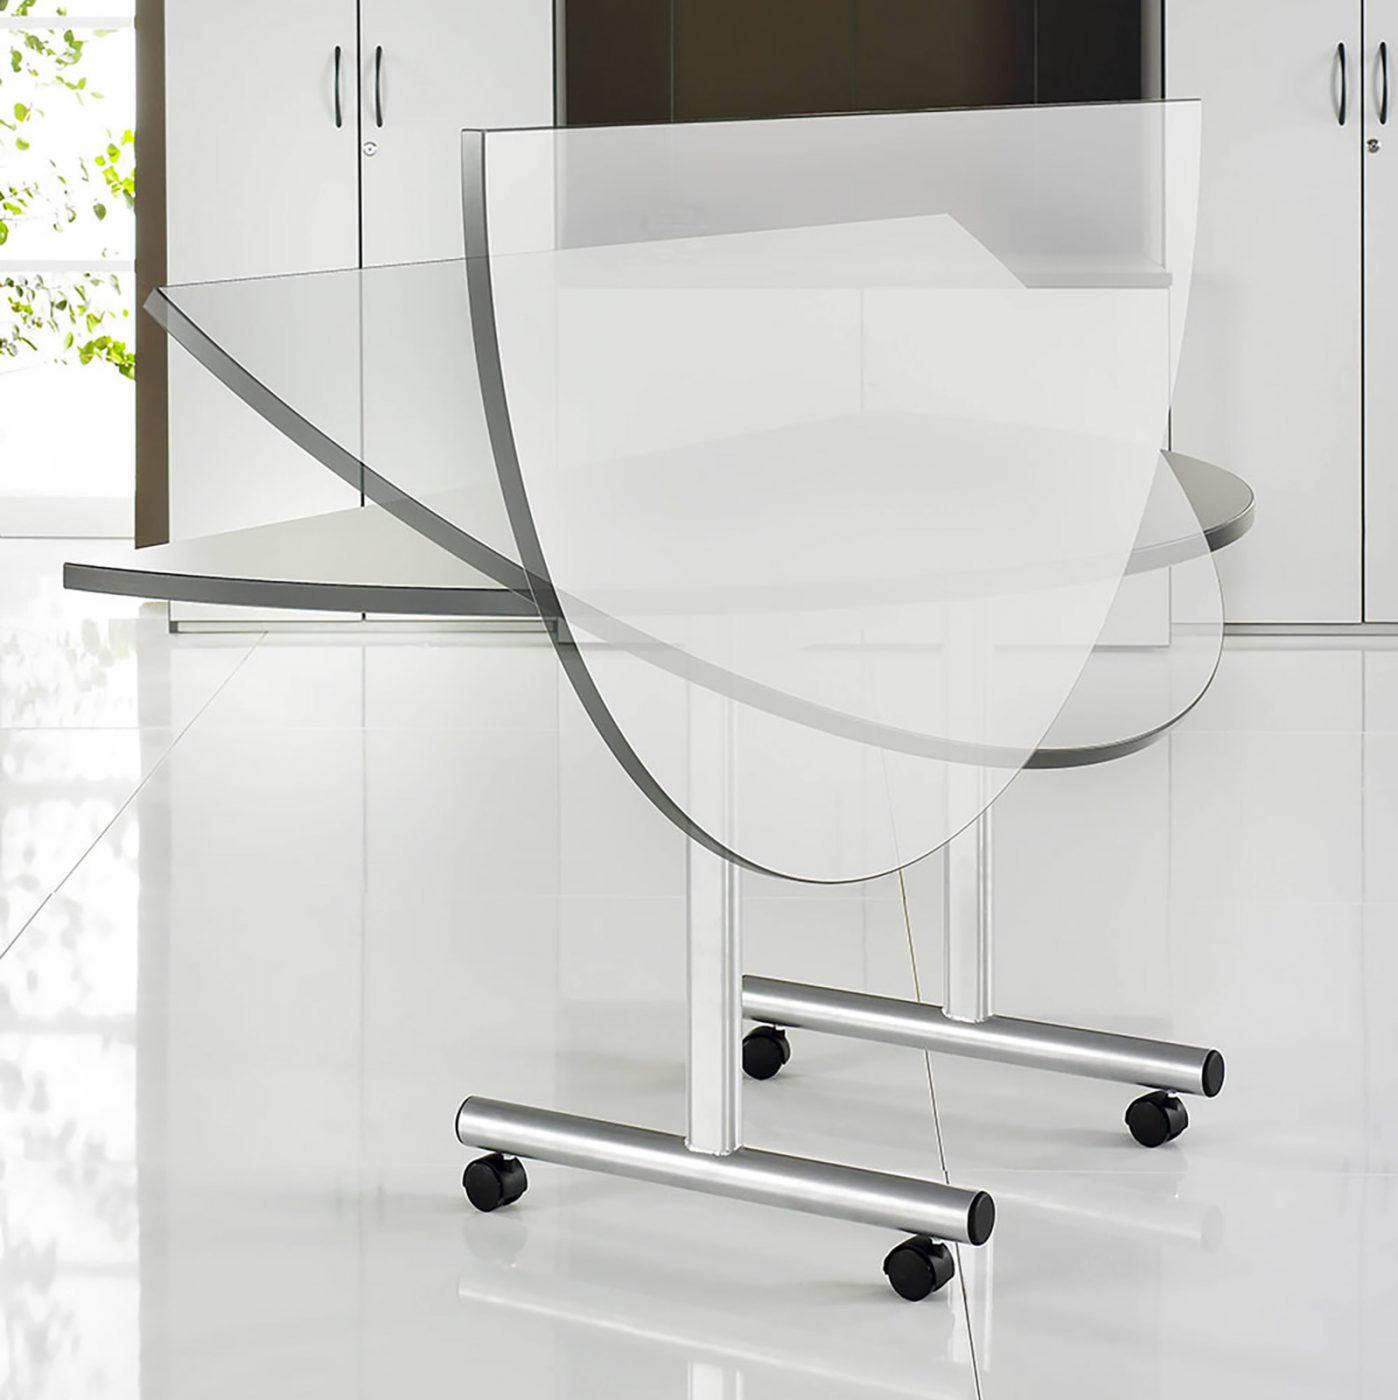 semi circular table, flip top table, mobile table, classroom furniture, office furniture